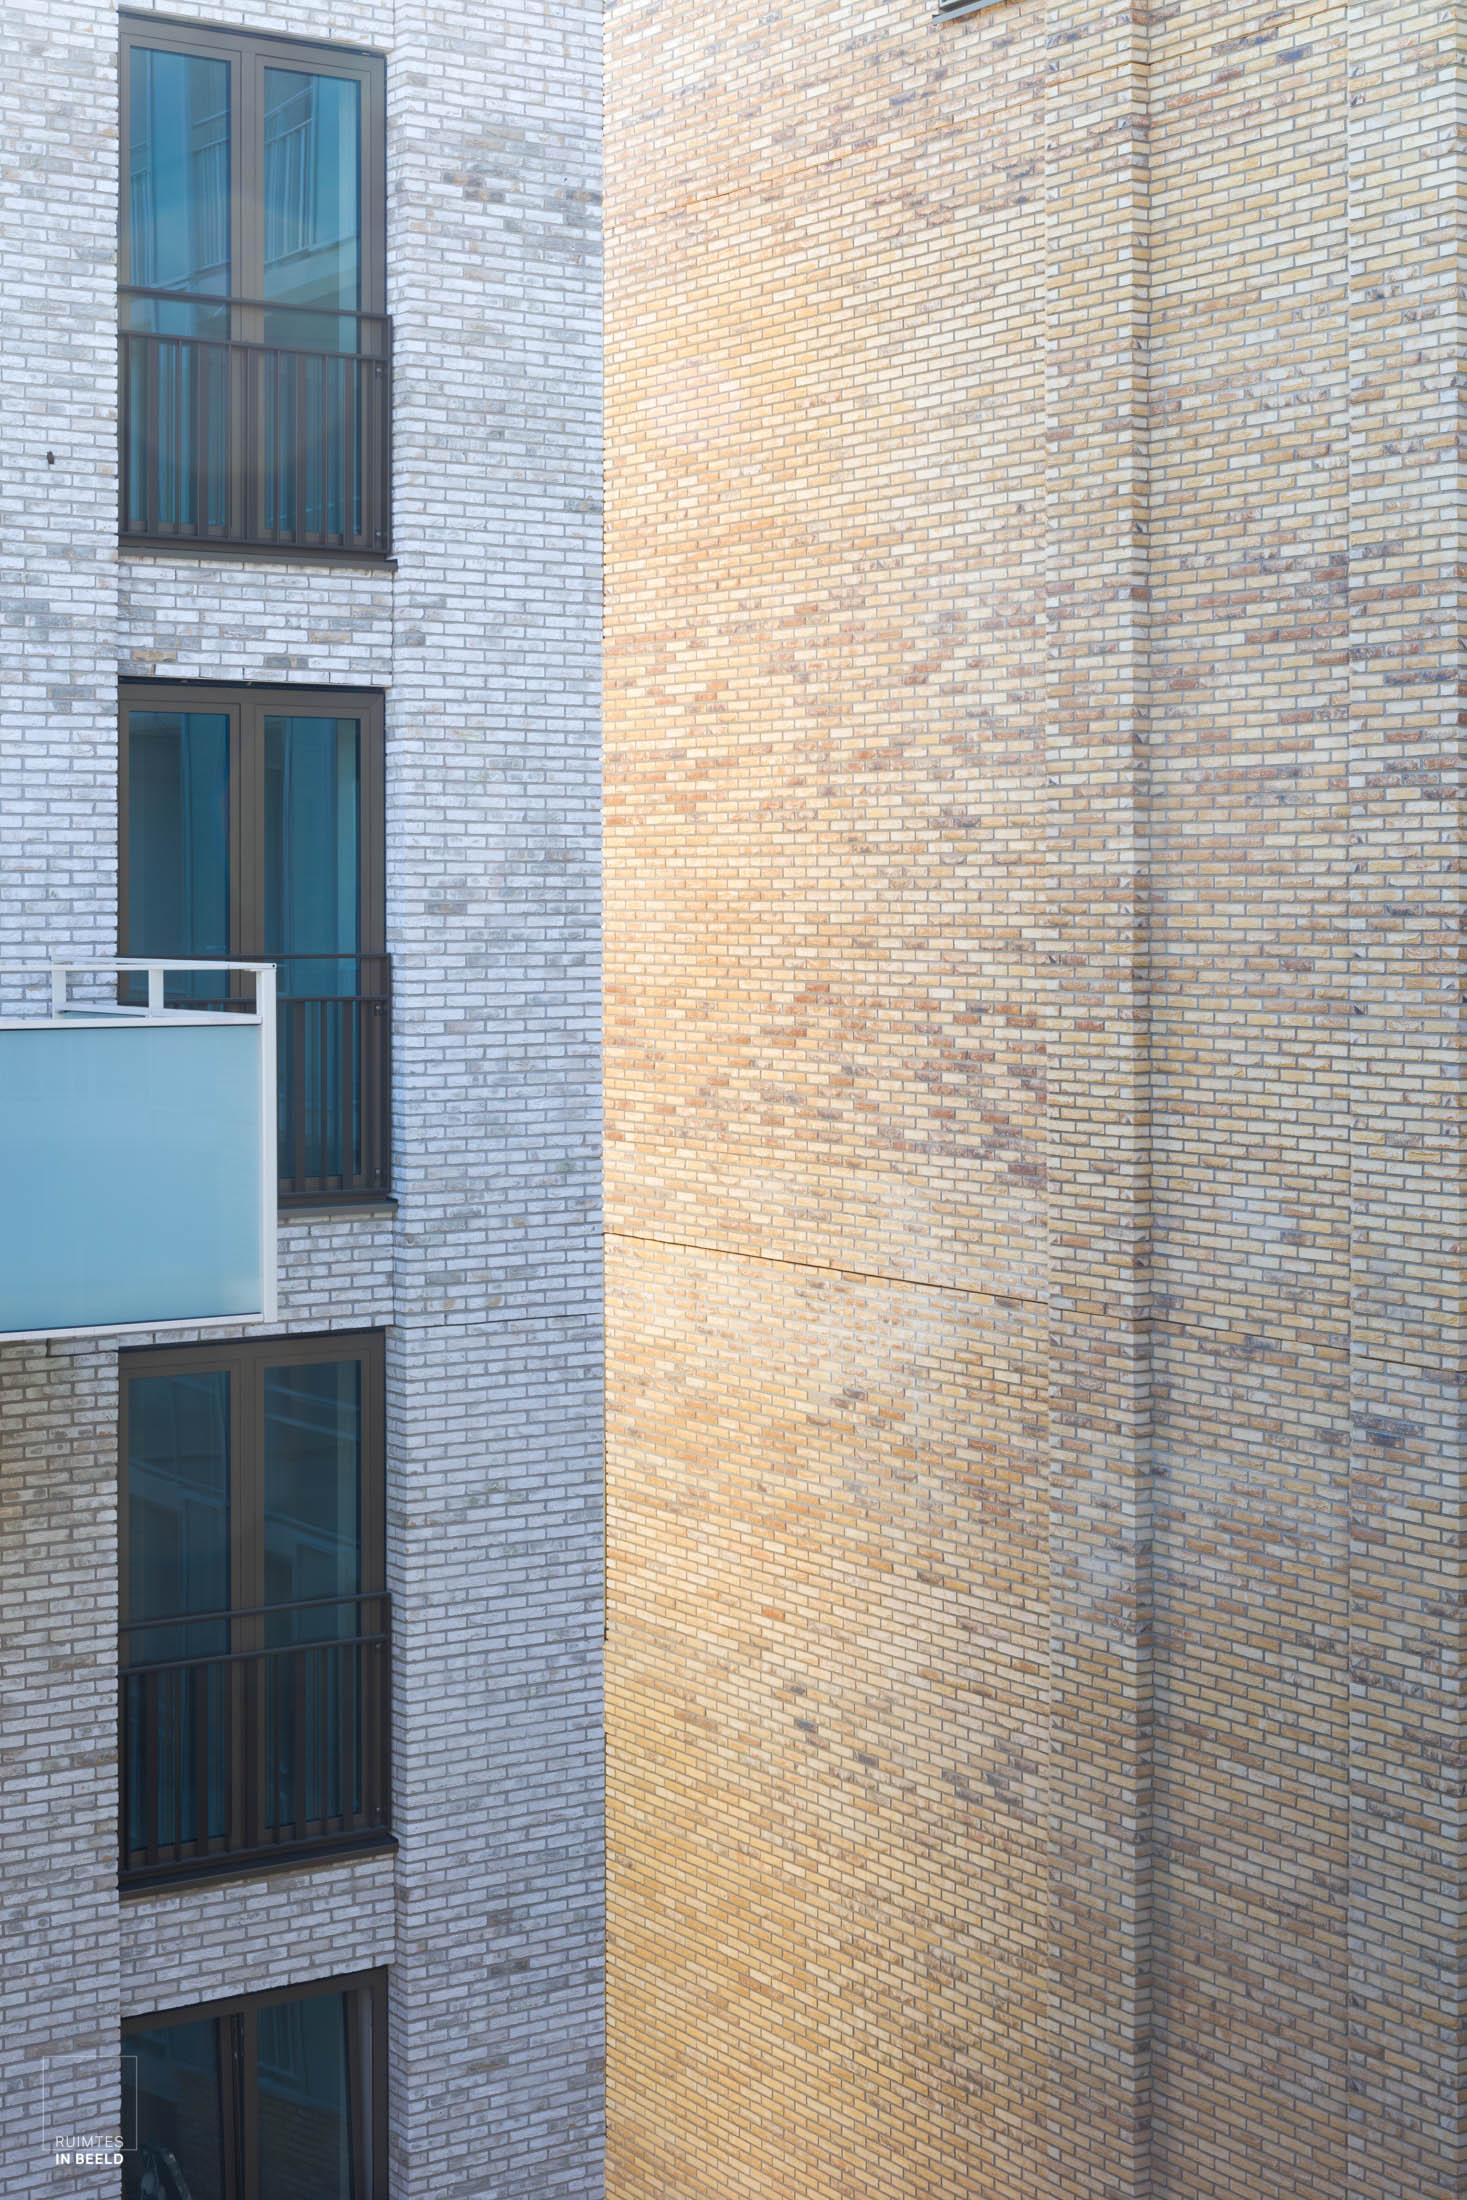 Appartementsgebouw, Leeuwenkamp Architecten